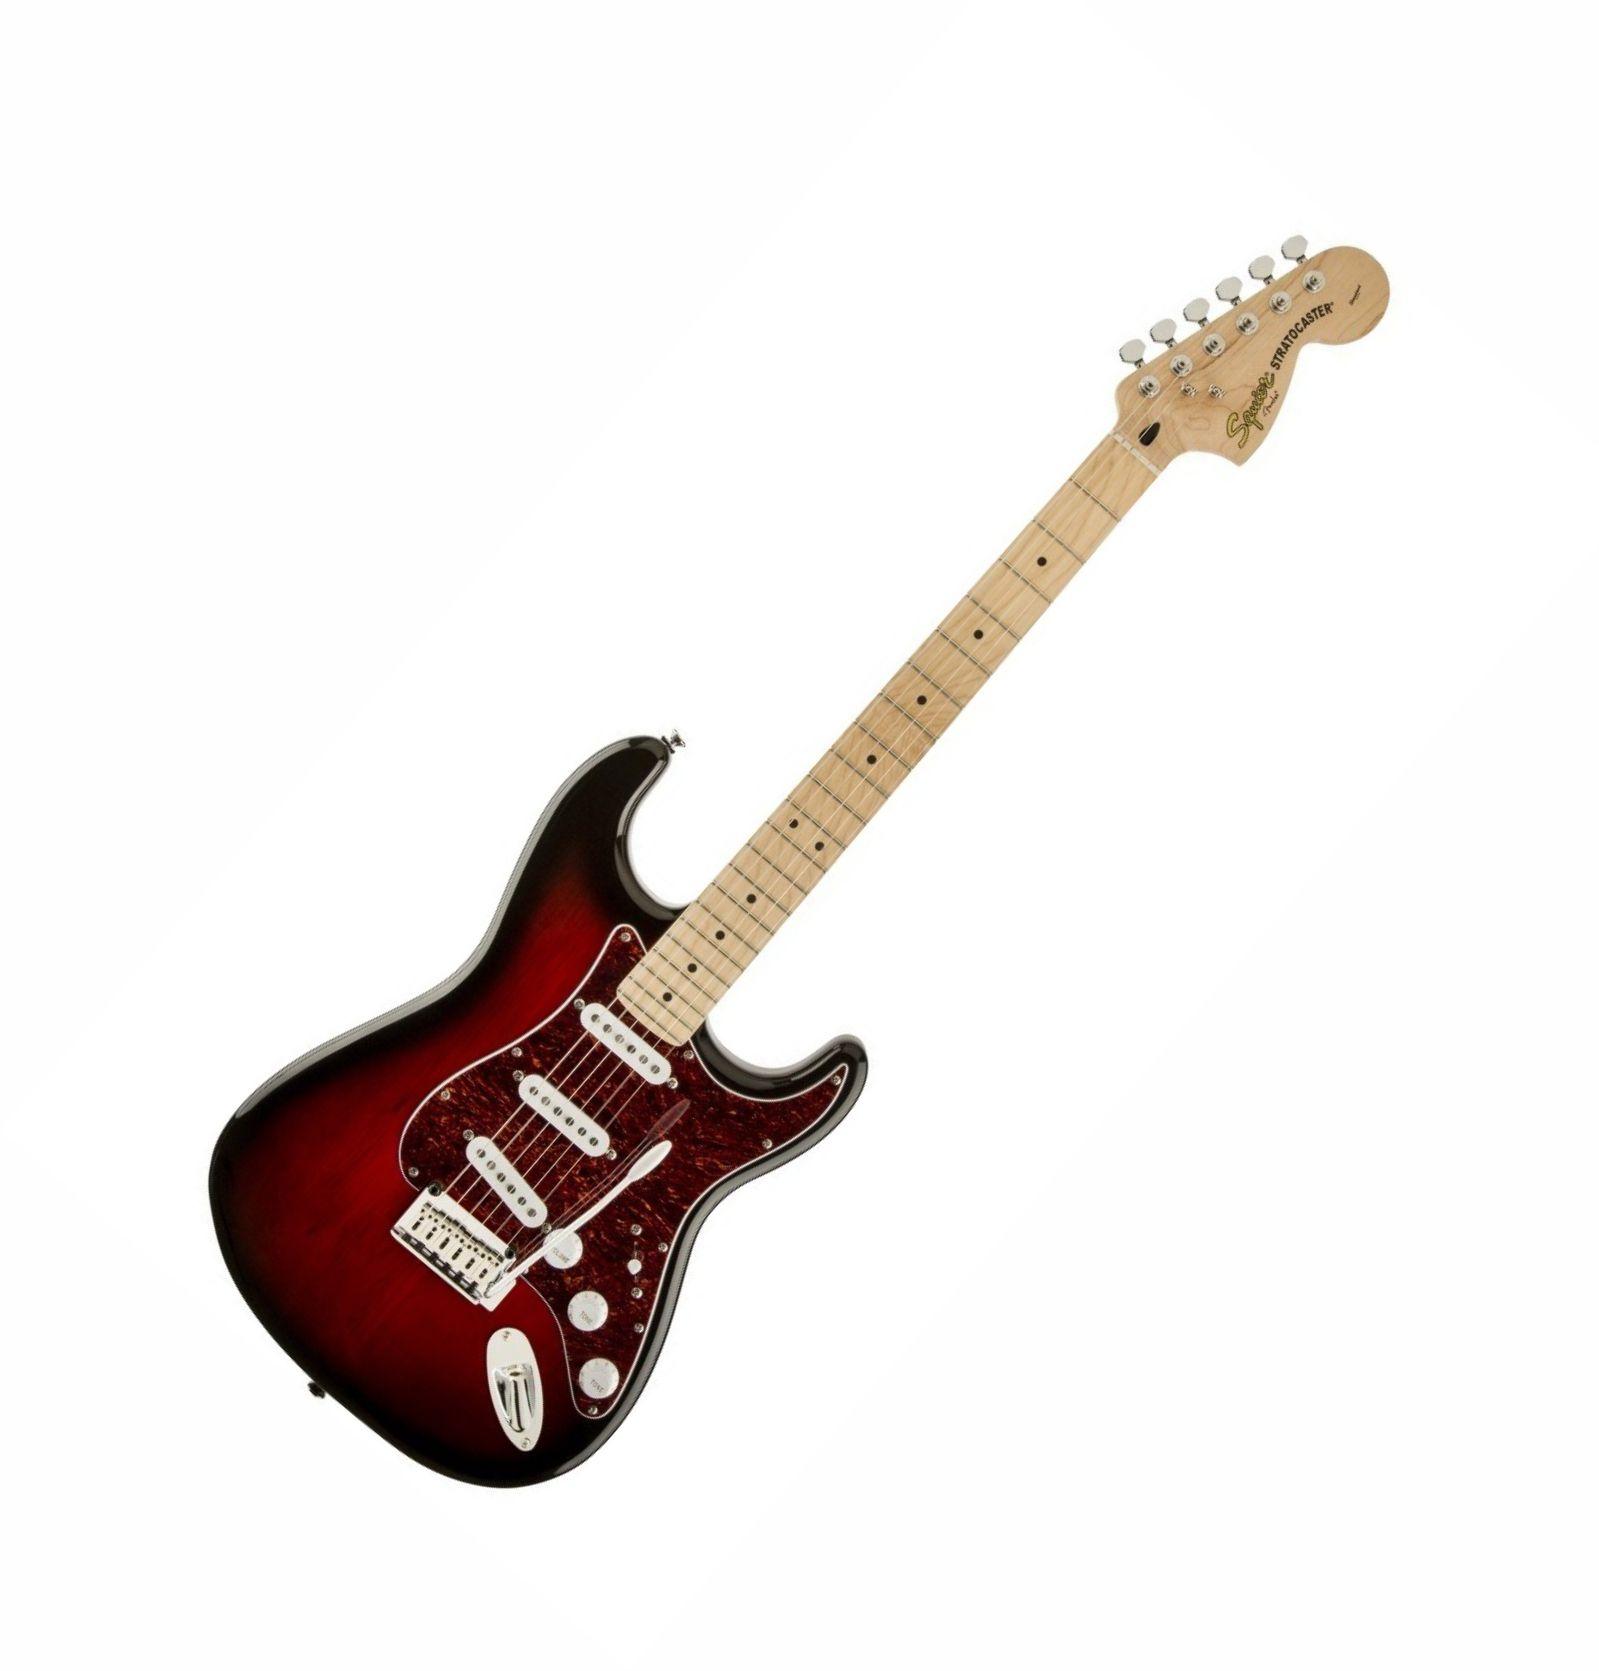 Guitarra Fender Squier Standard Stratocaster Antique Burst